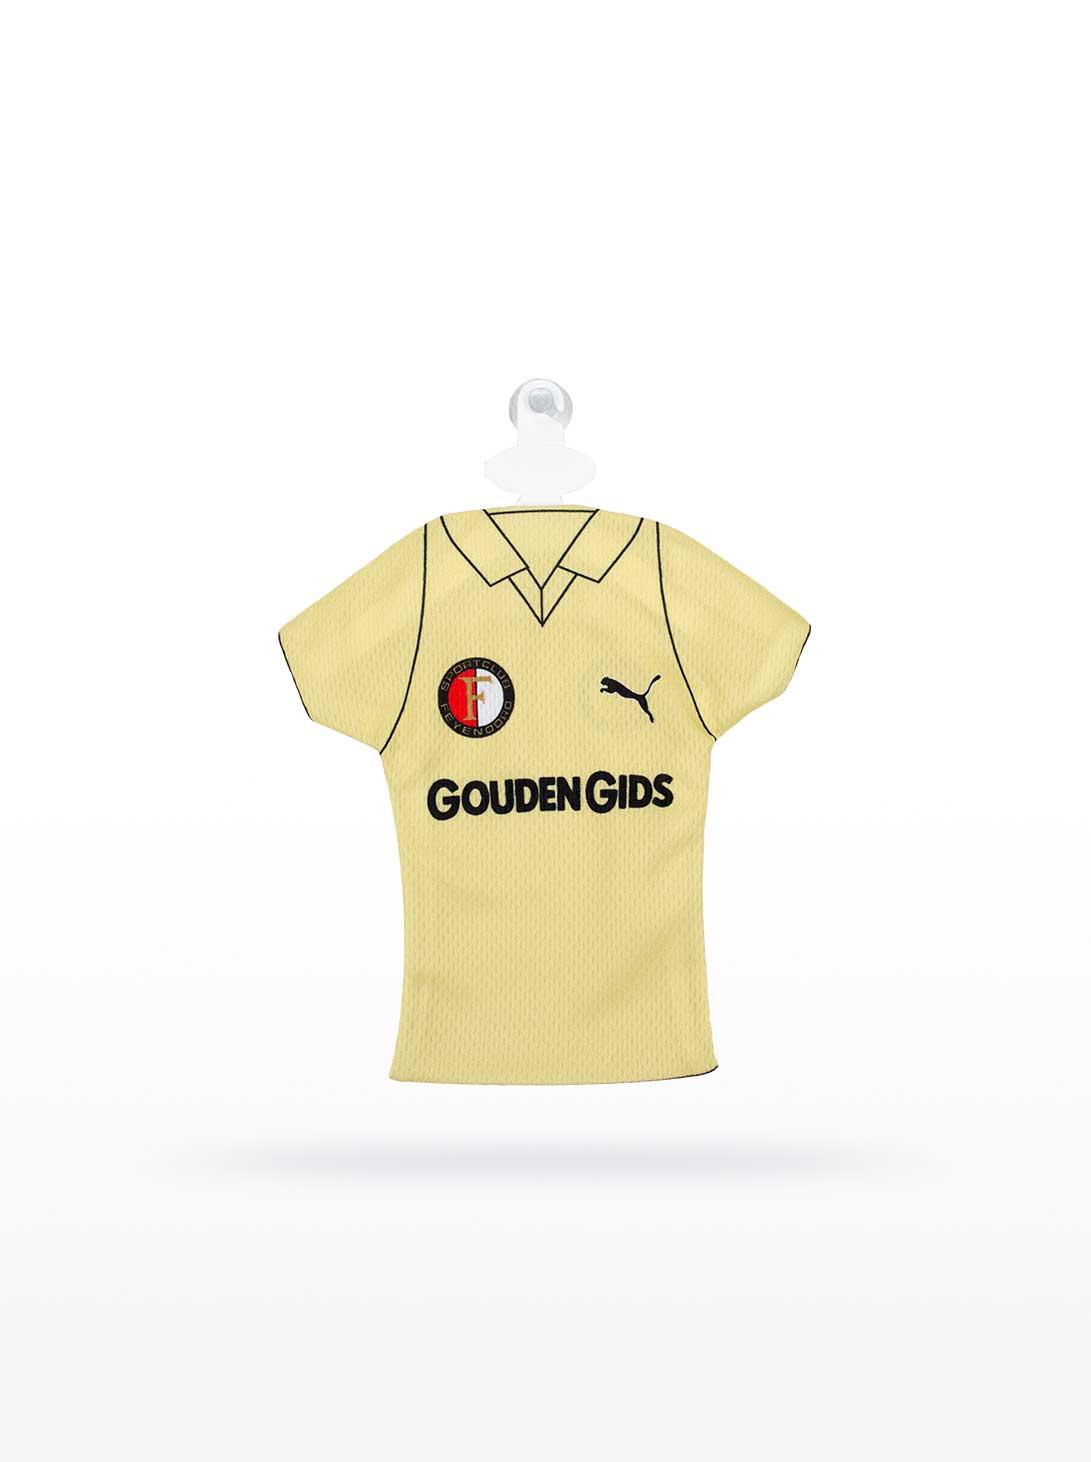 Feyenoord Minidress 1983-1984, Uitshirt Gouden Gids